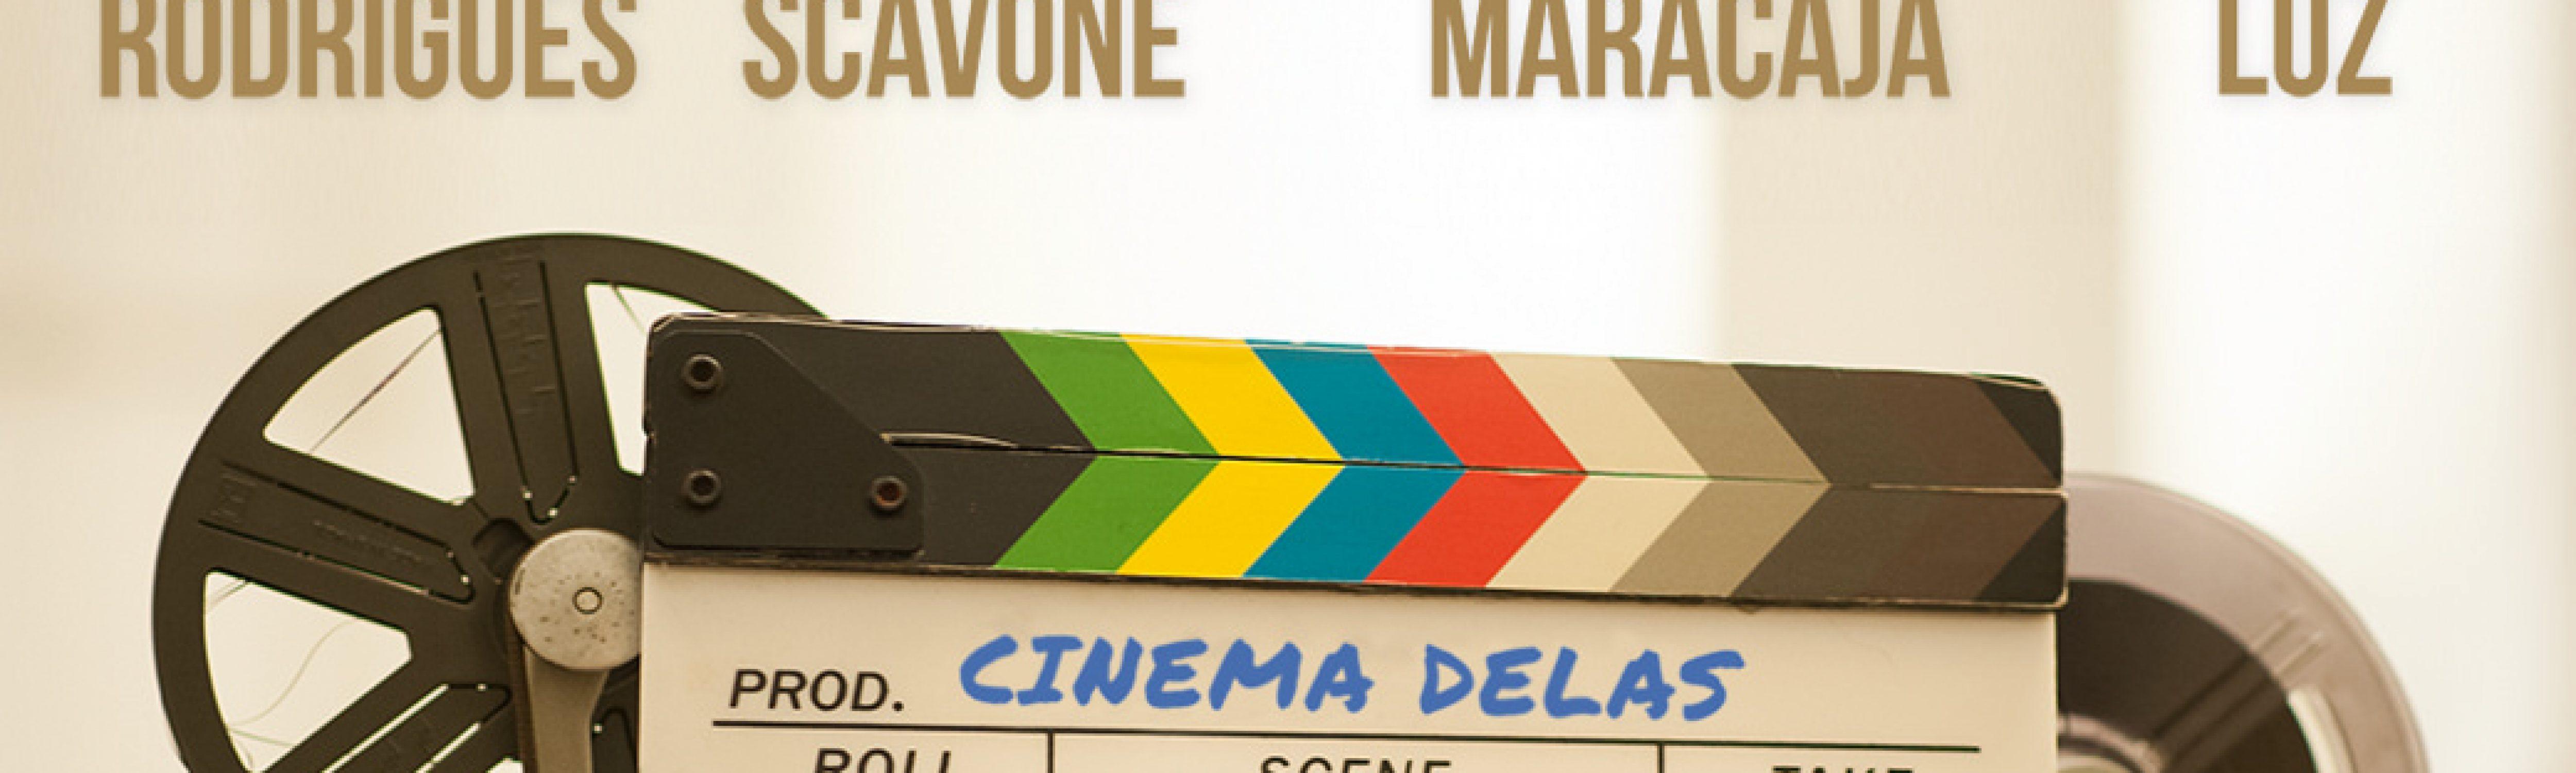 26-Cinema-Delas.jpg